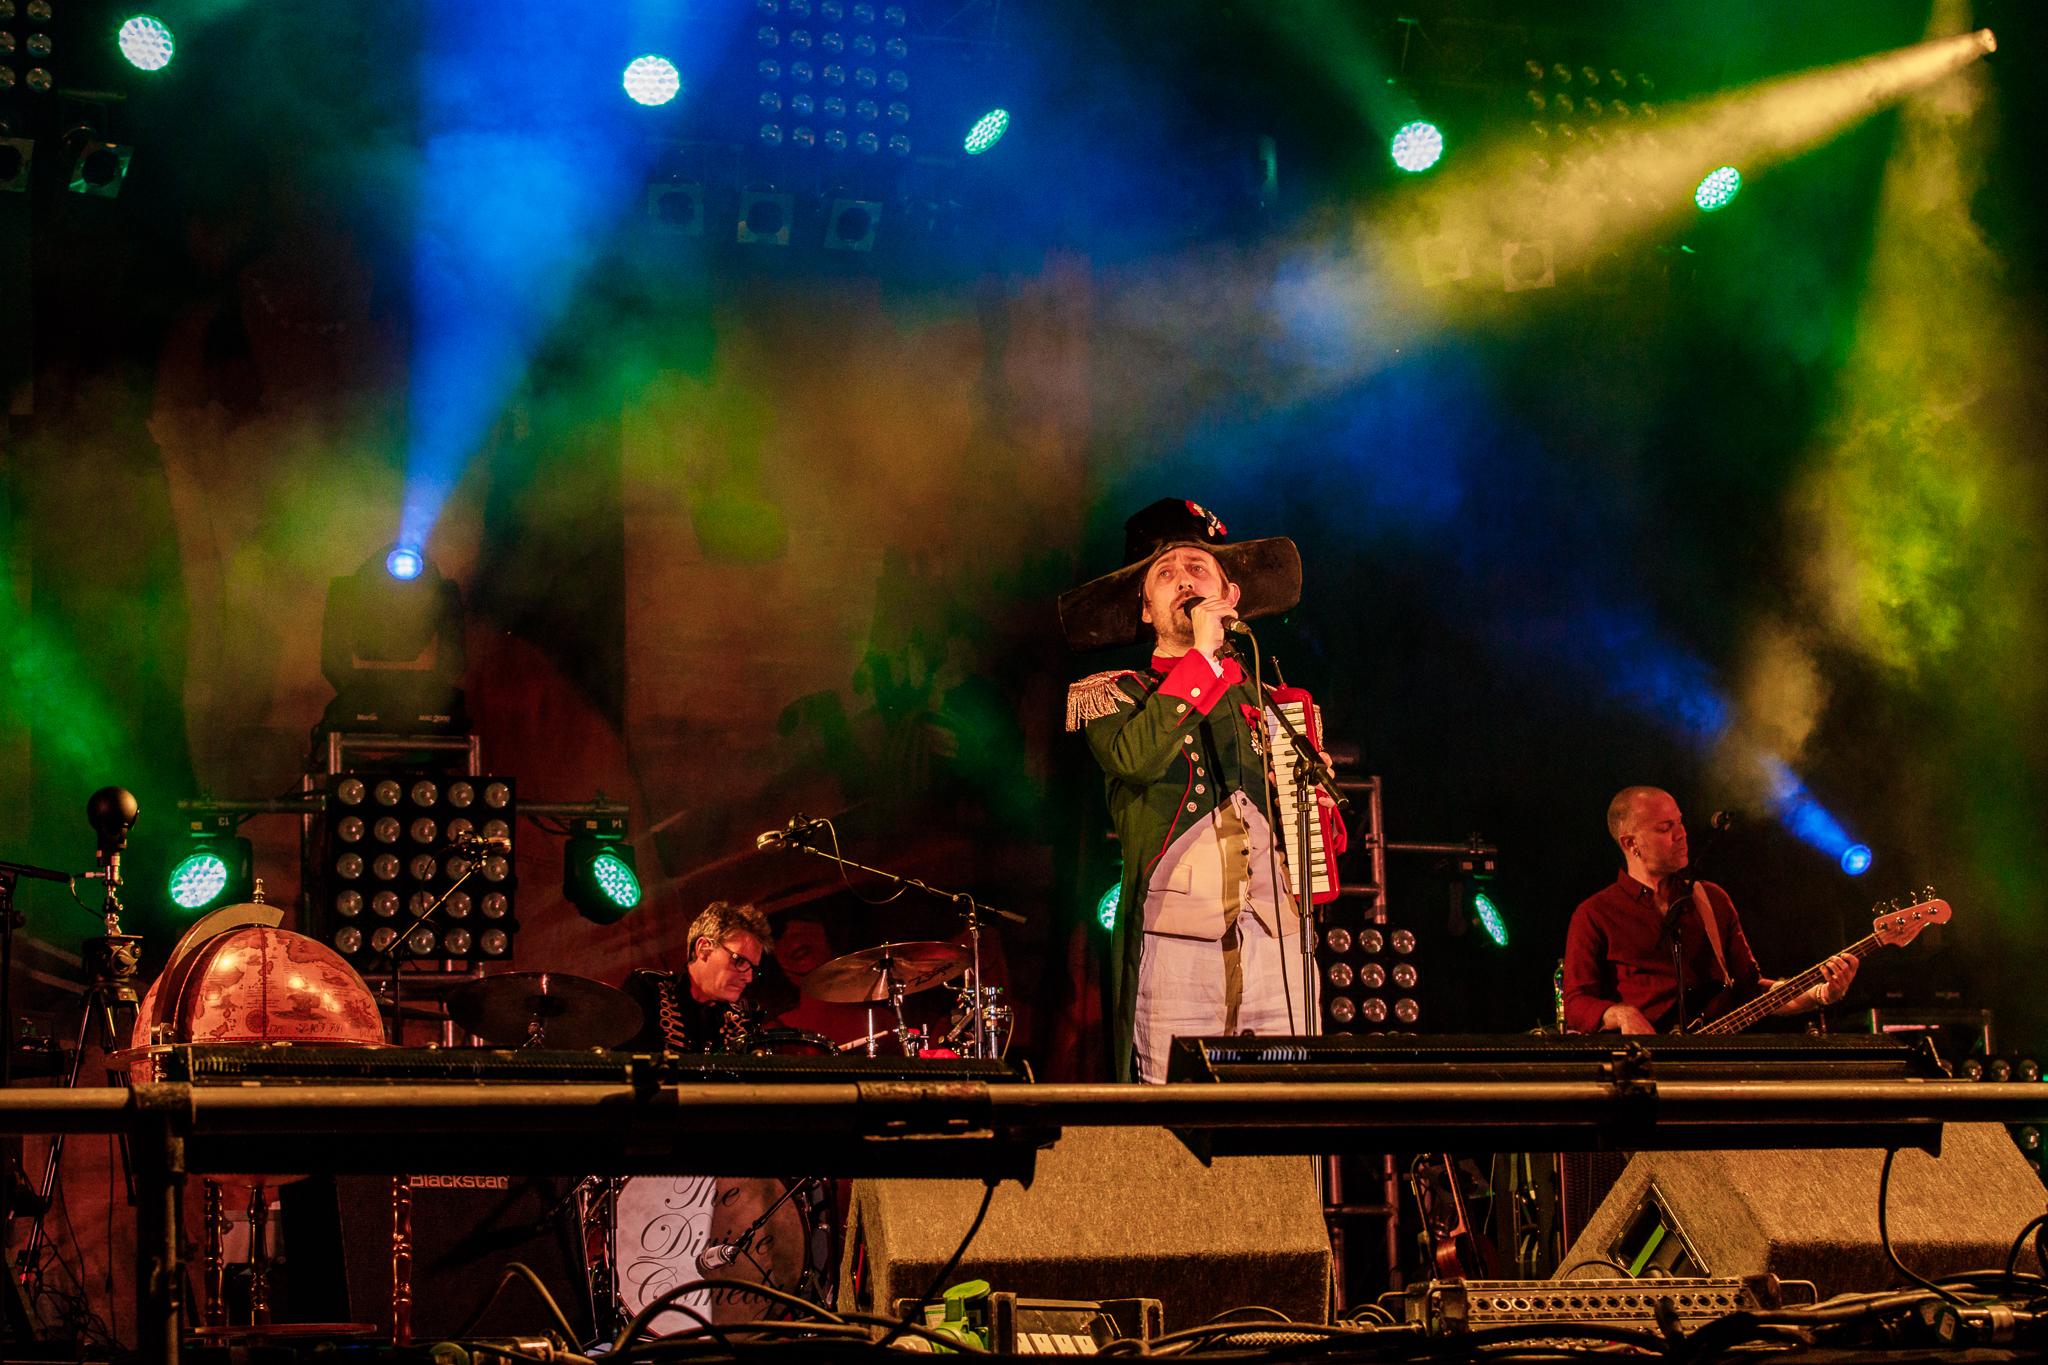 The Divine Comedy at Fairport's Cropredy Convention (photo by Matt Condon / @arcane93)